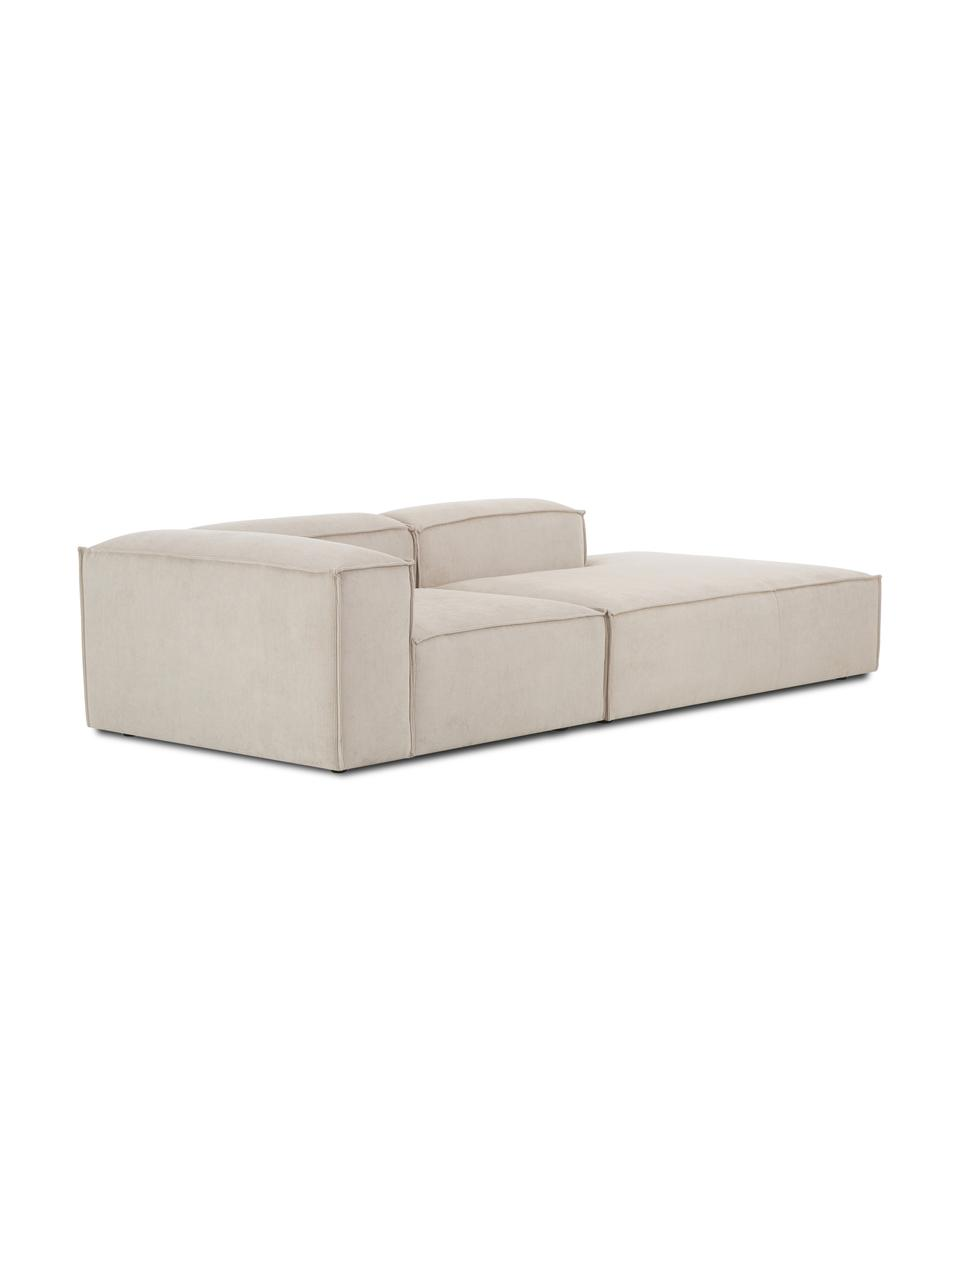 Modulaire chaise longue Lennon in beige van corduroy, Bekleding: corduroy (92% polyester, , Frame: massief grenenhout, multi, Poten: kunststof De poten bevind, Corduroy beige, B 269 x D 119 cm